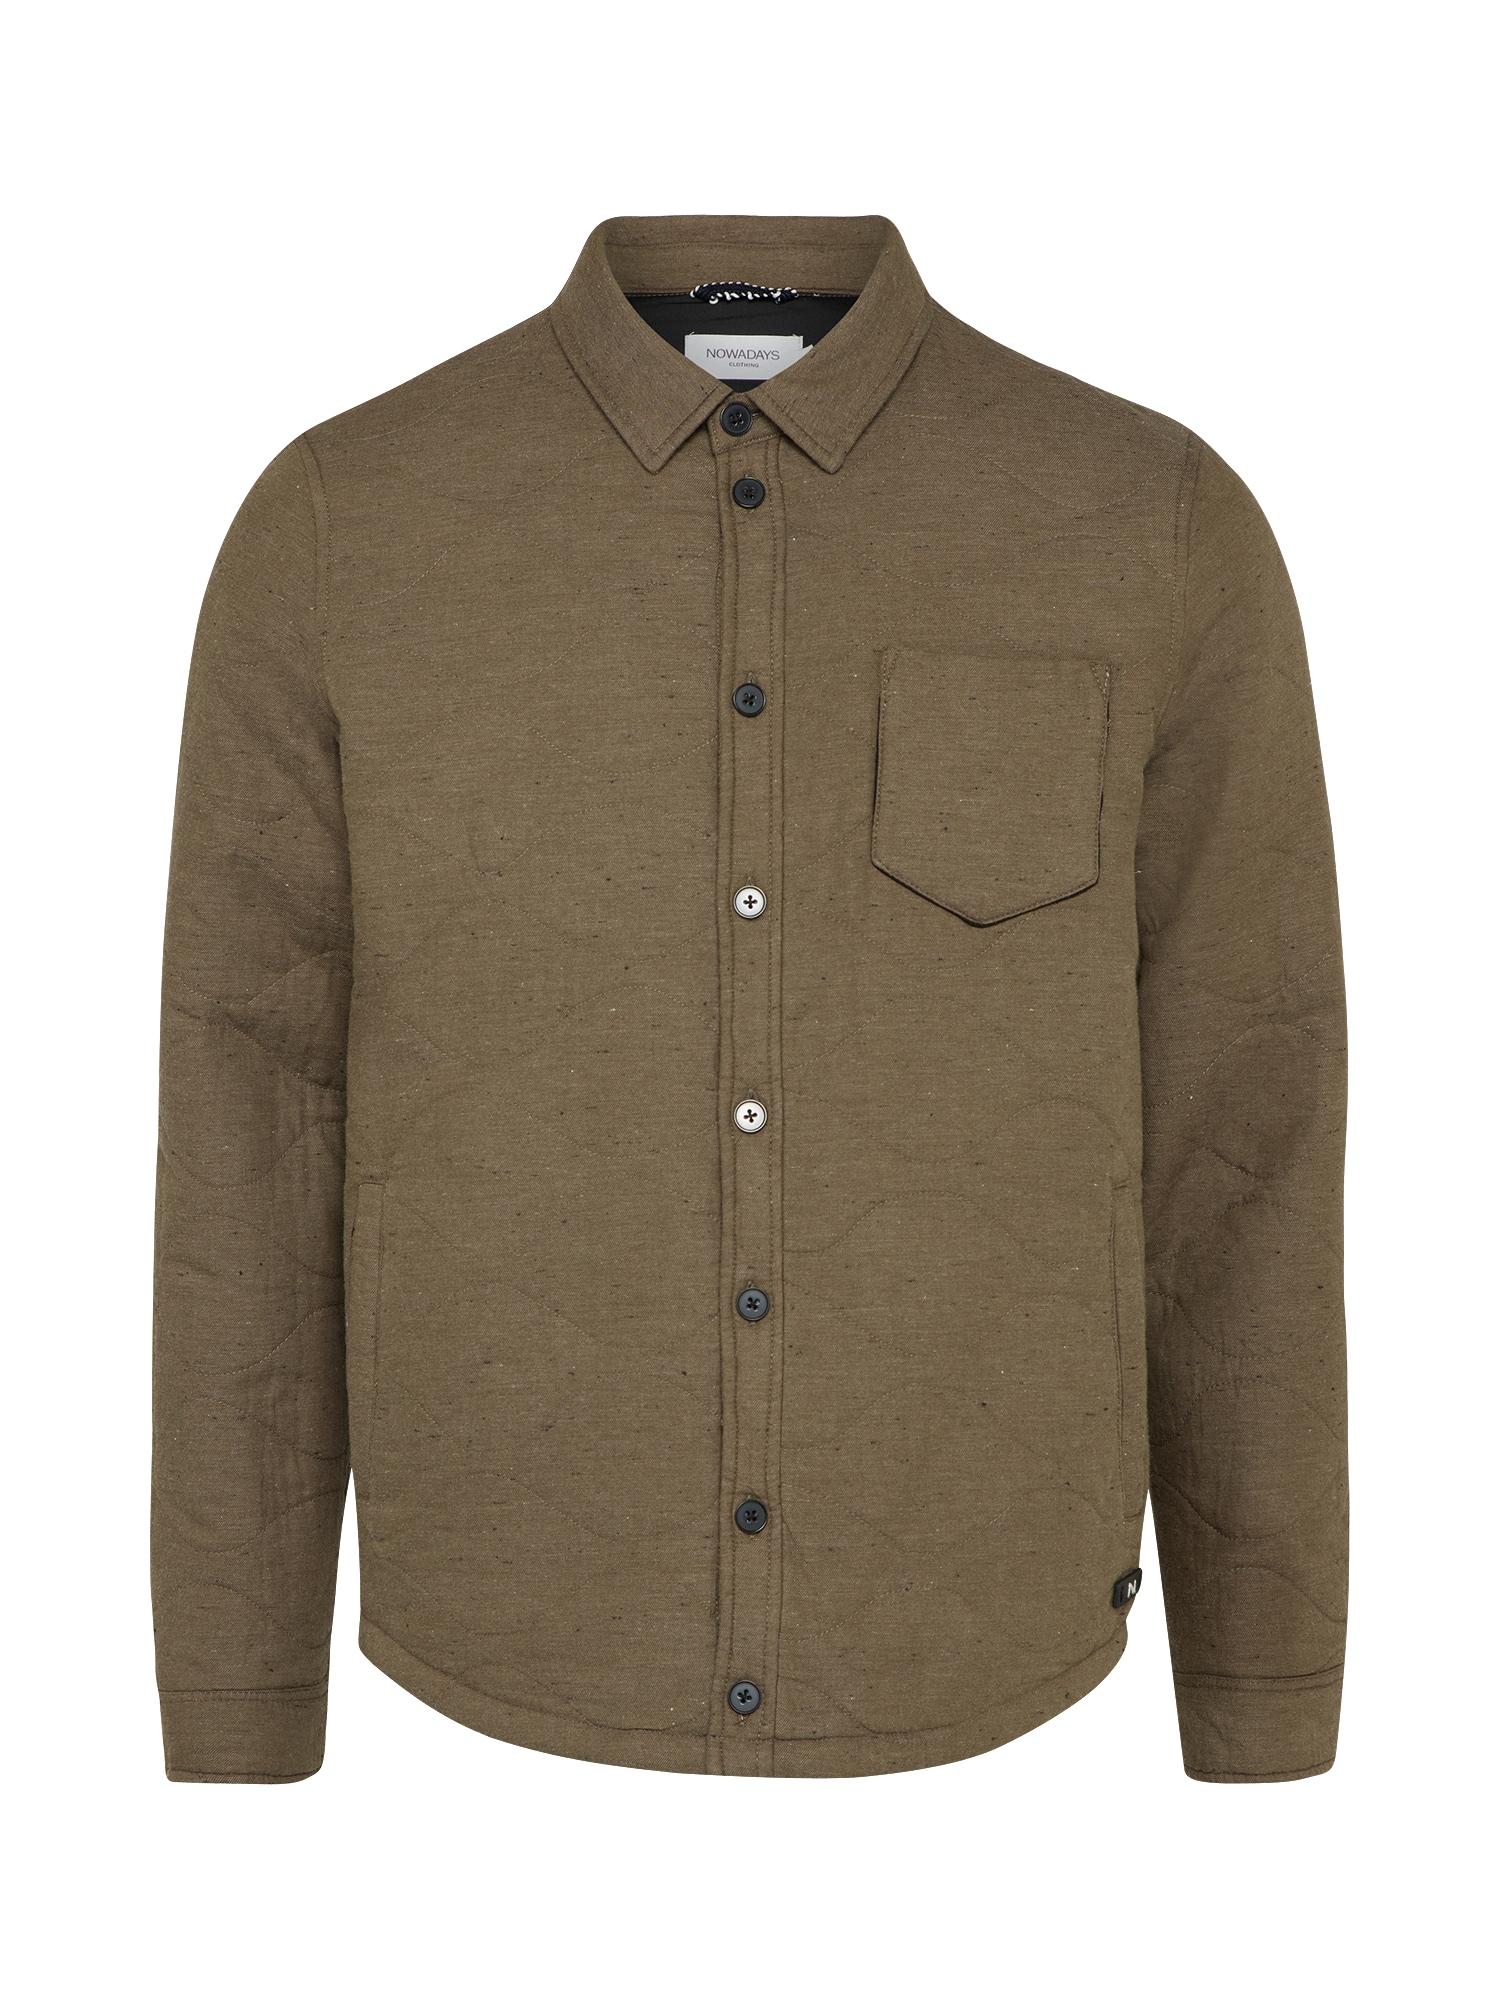 - Herren Übergangsjacke quilted jacket khaki | 04250877566925